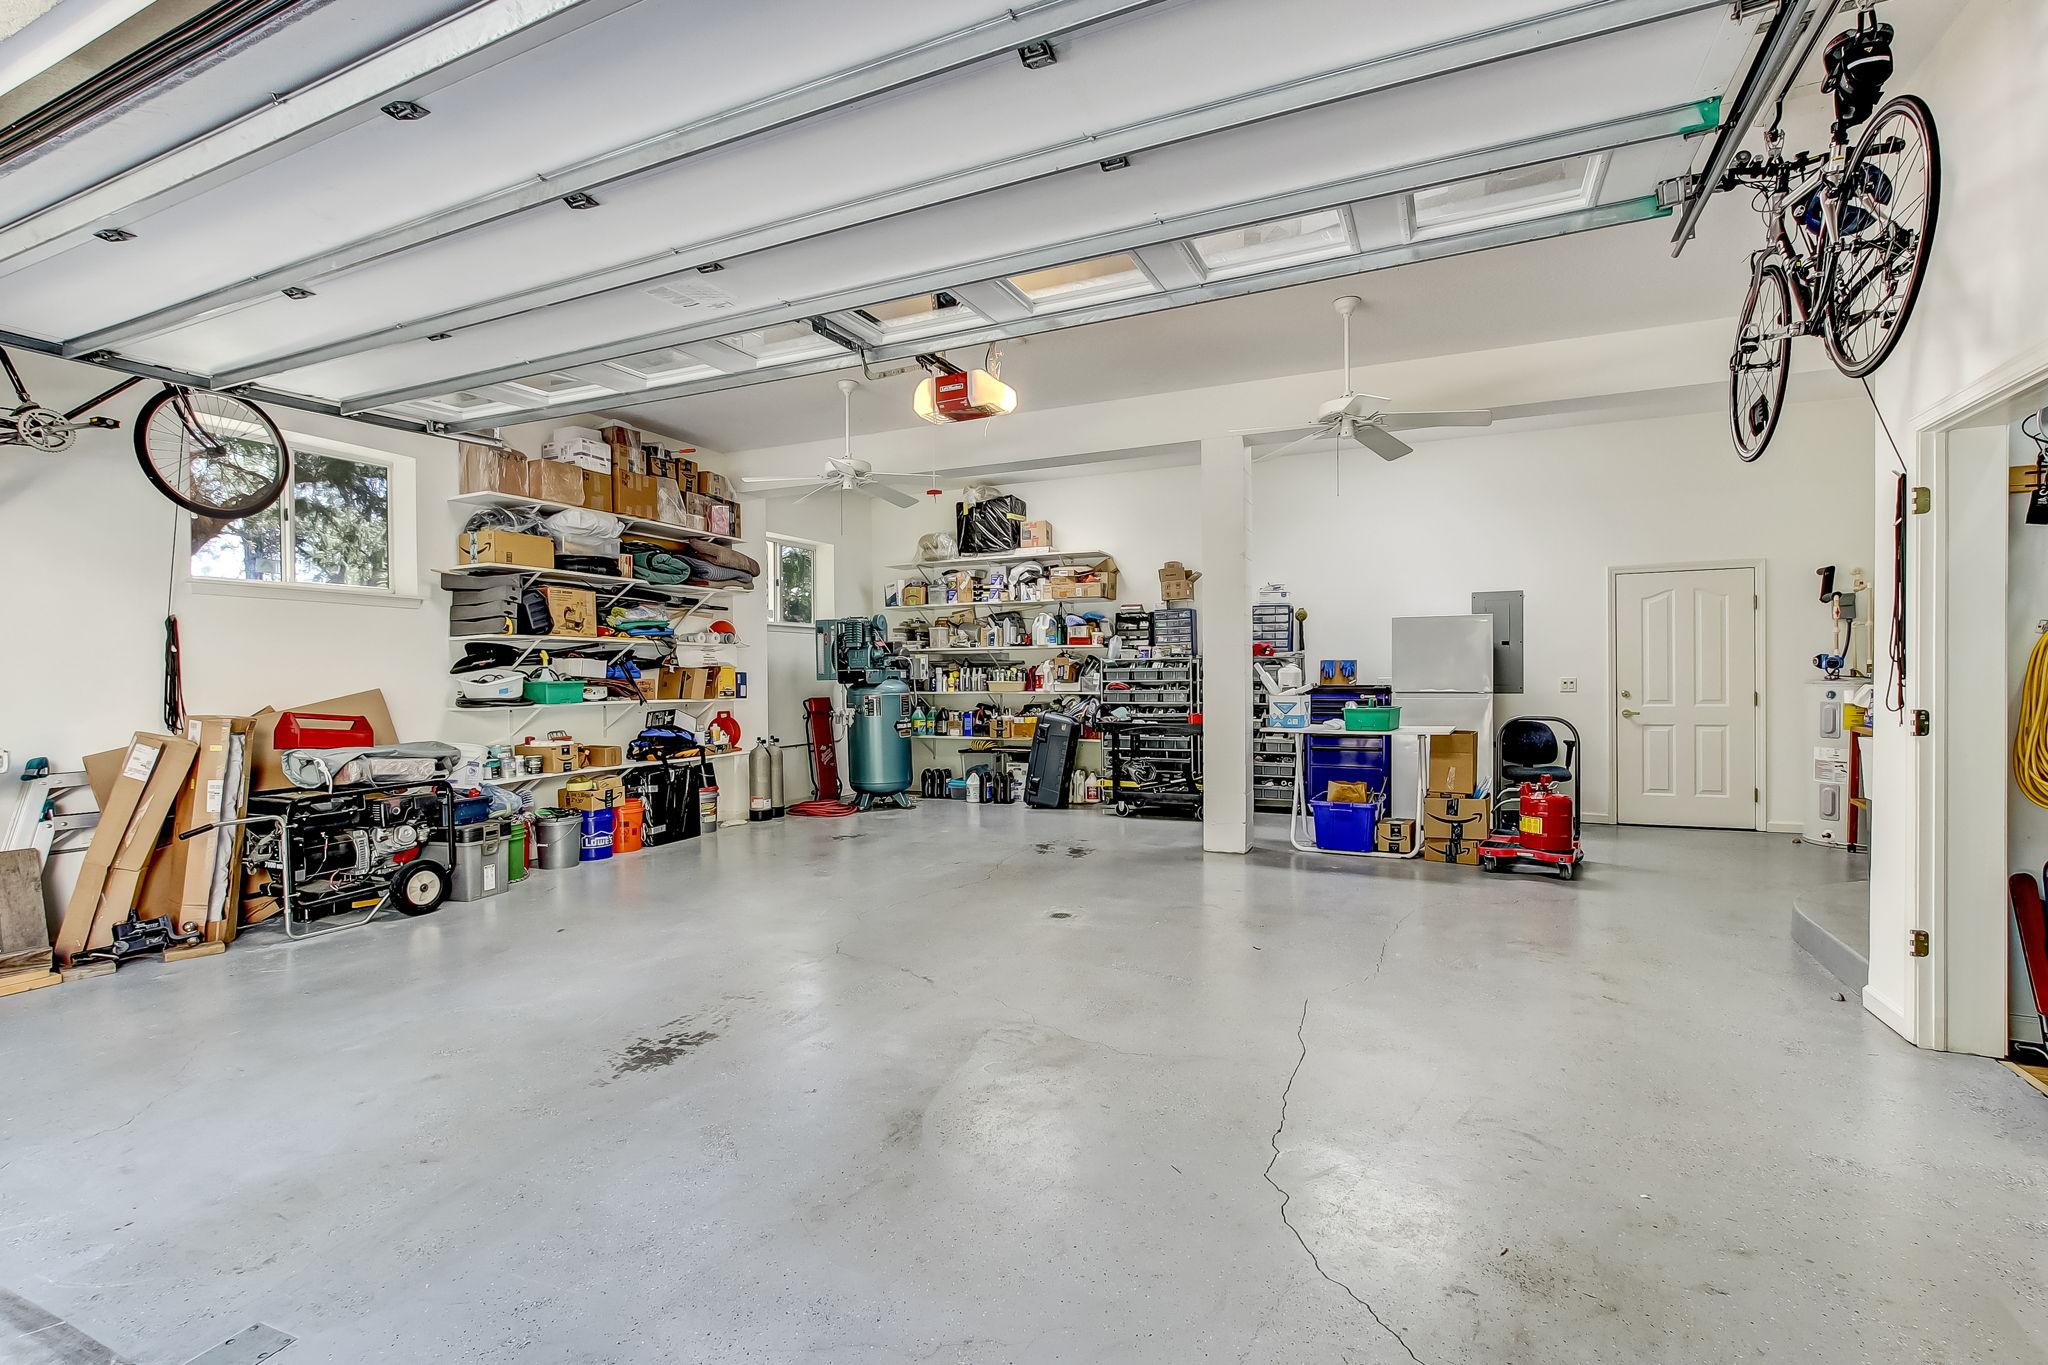 Oversized garage with engineered elevator shaft